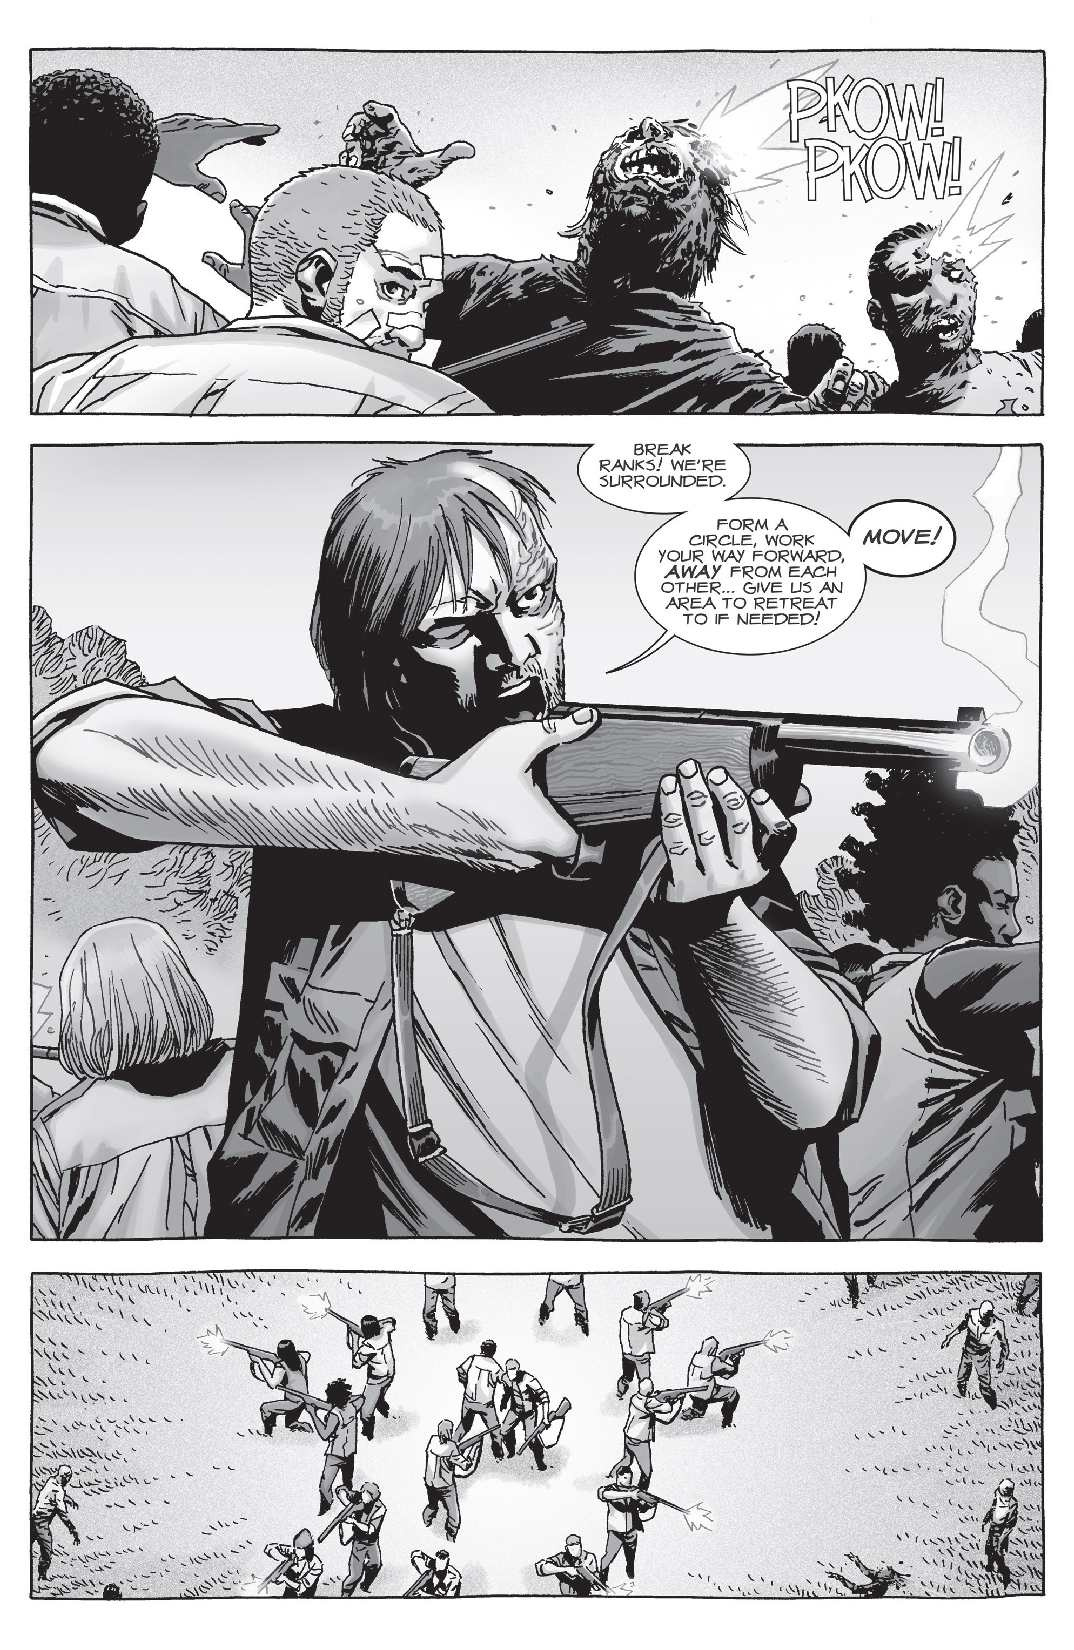 Read Comics Online Free - The Walking Dead - Chapter 151